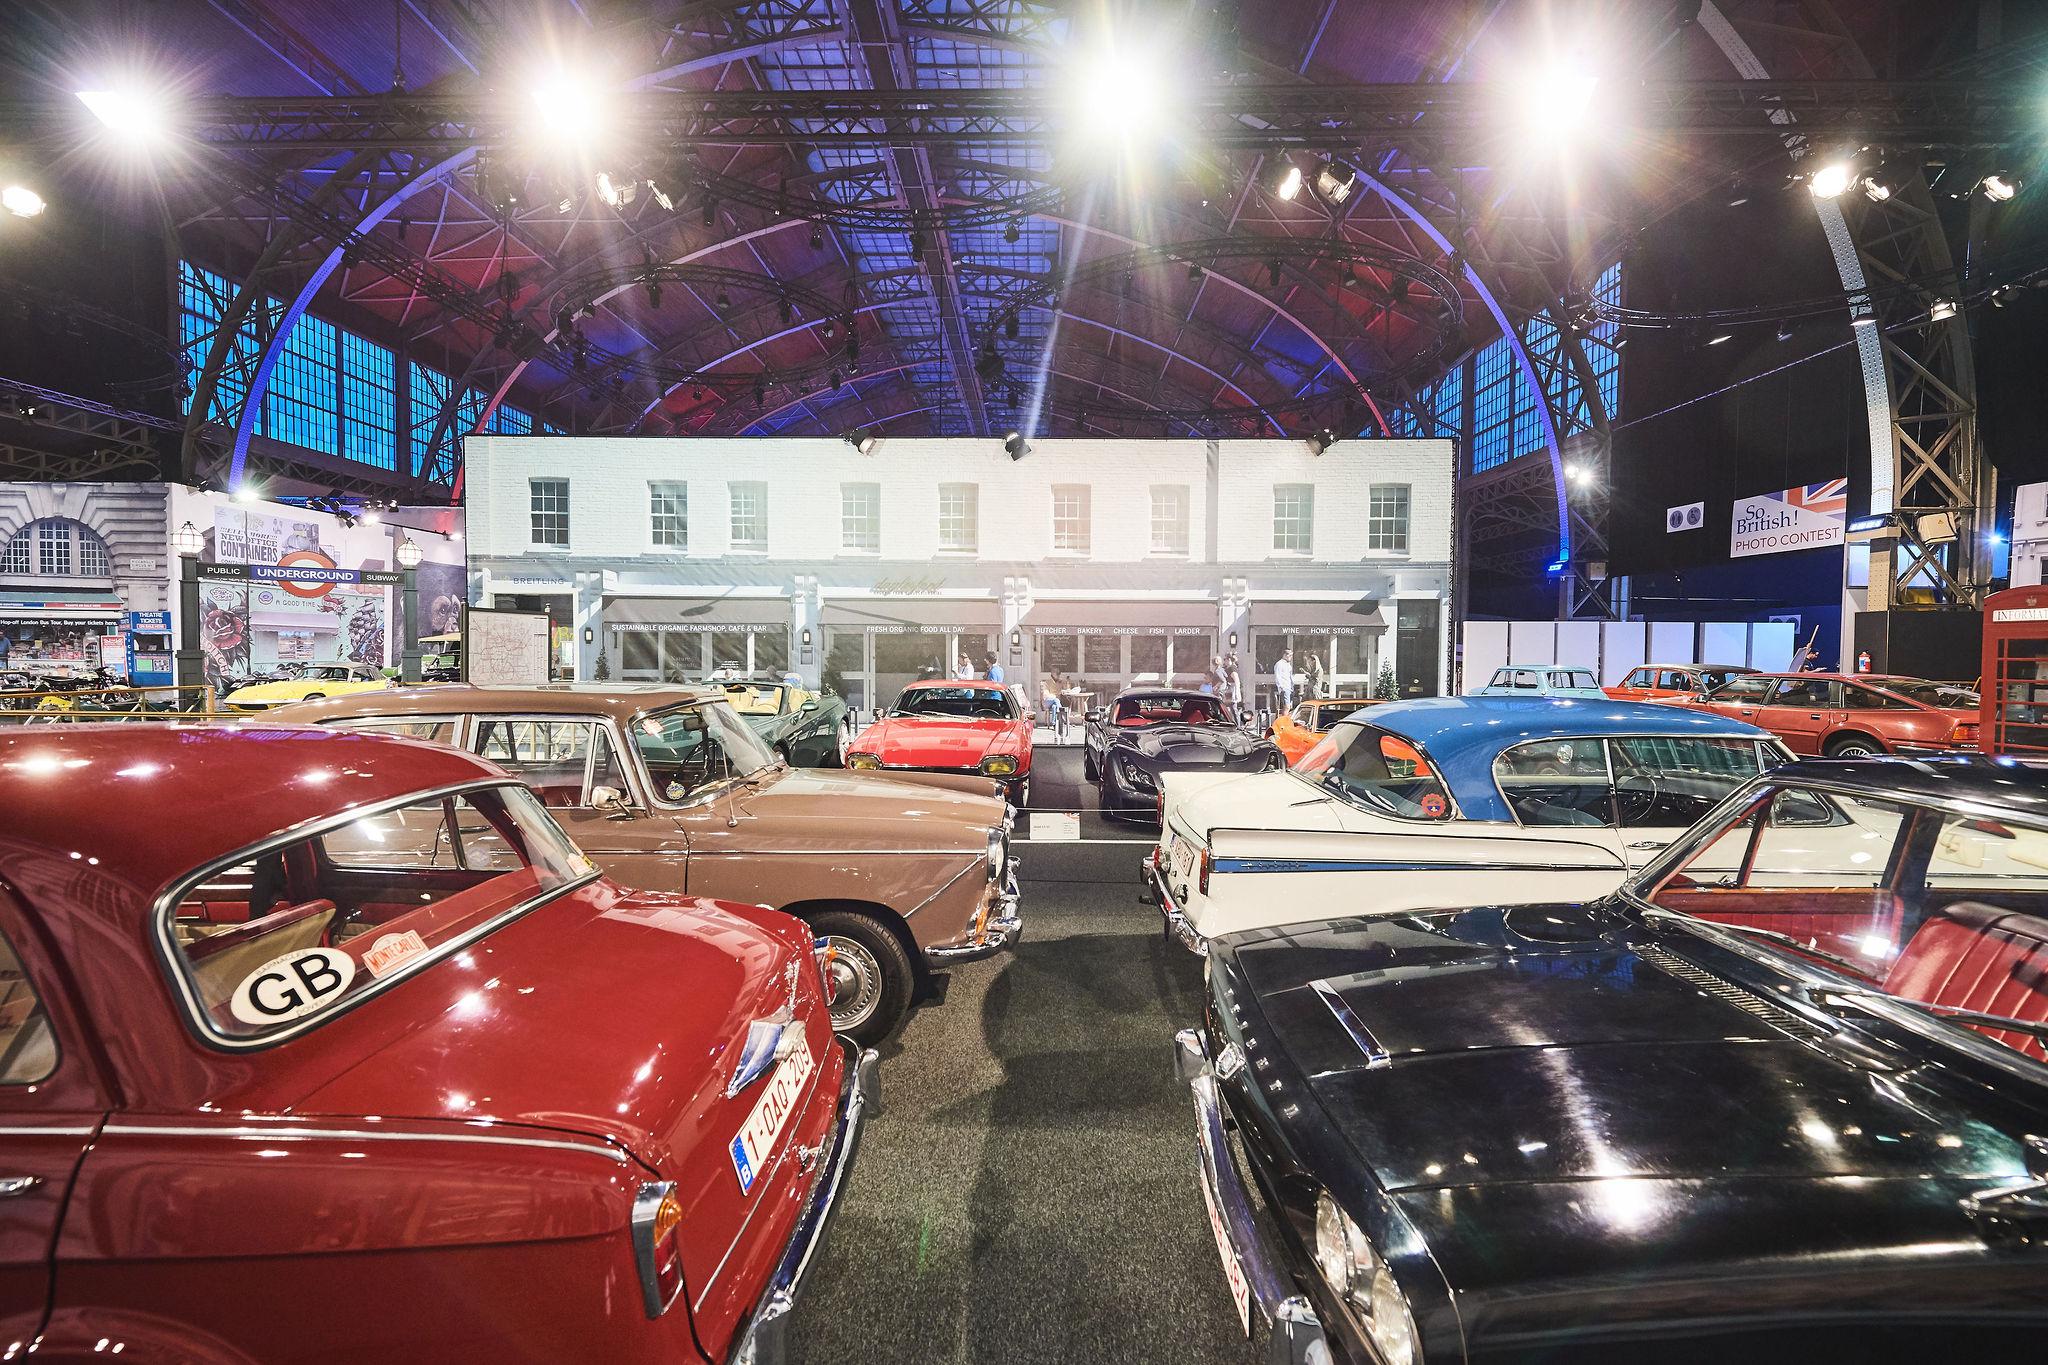 191212-Autoworld-So-British! exposition 17